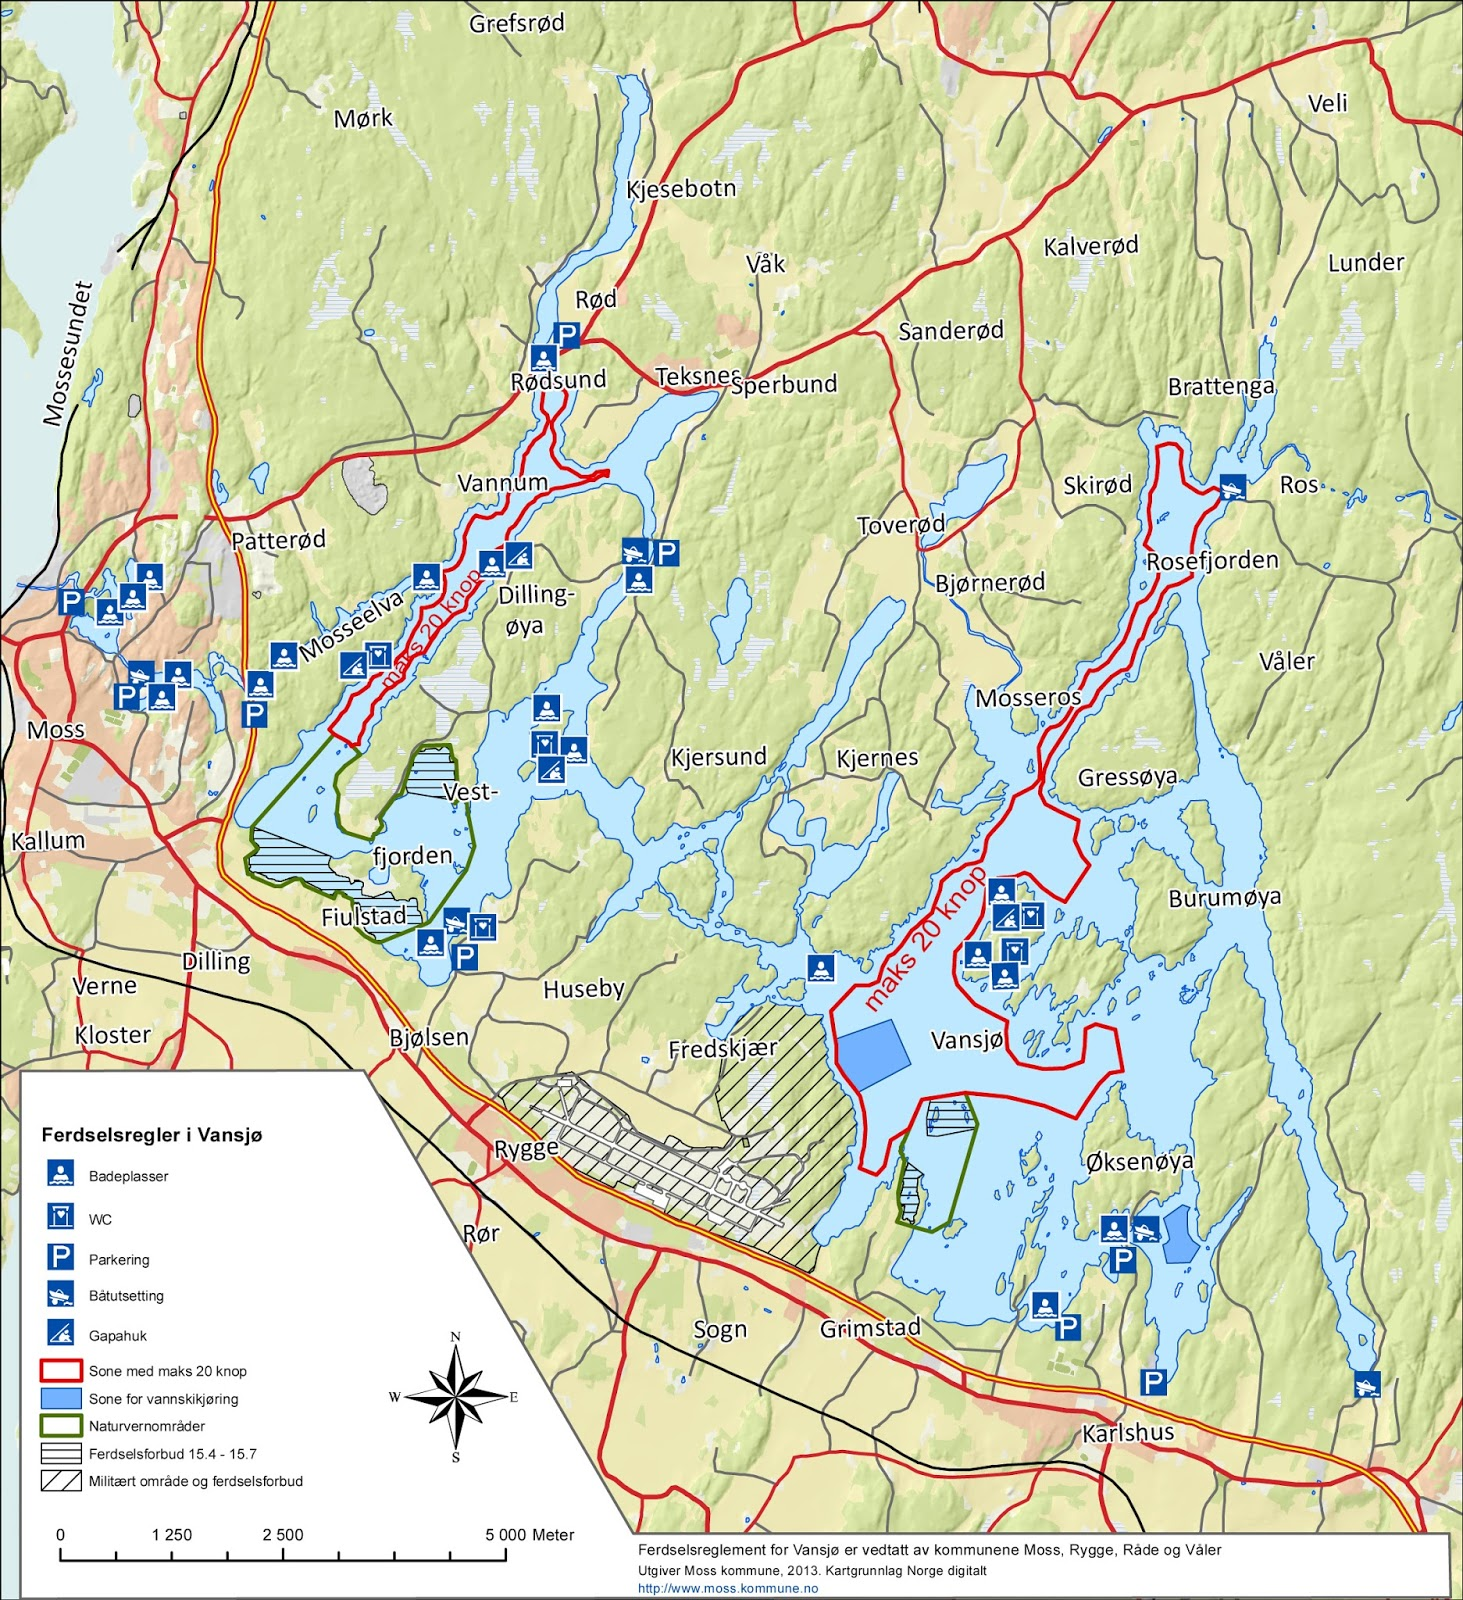 vansjø kart Lisa: Østlands ferie ute i det fri vansjø kart